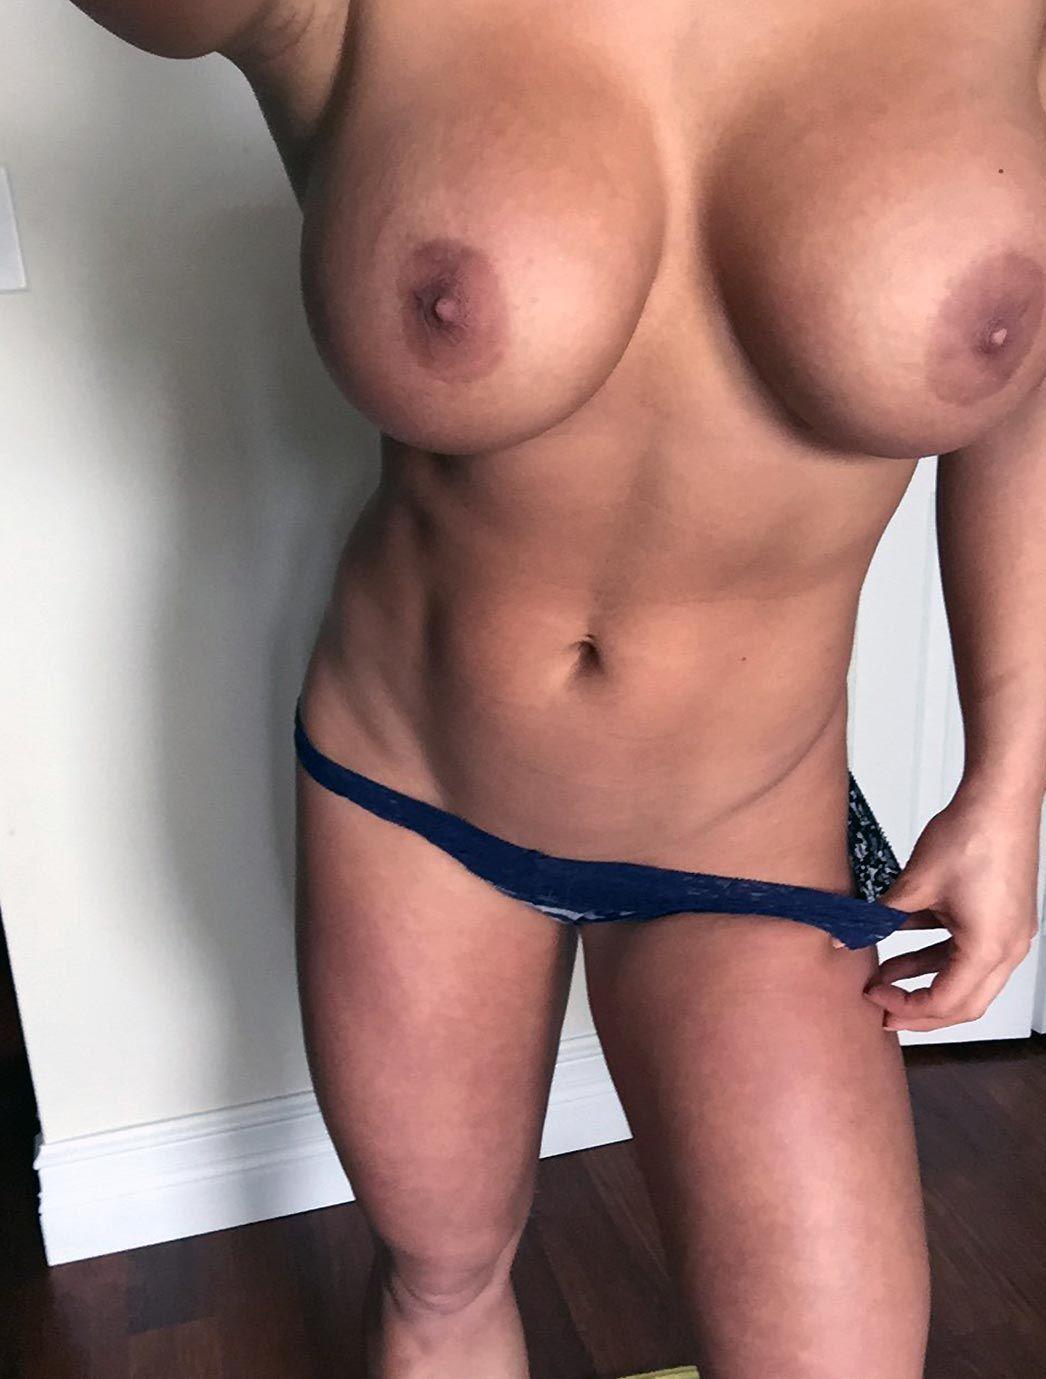 Celeste Bonin Nude Leaked The Fappening & Sexy 0152